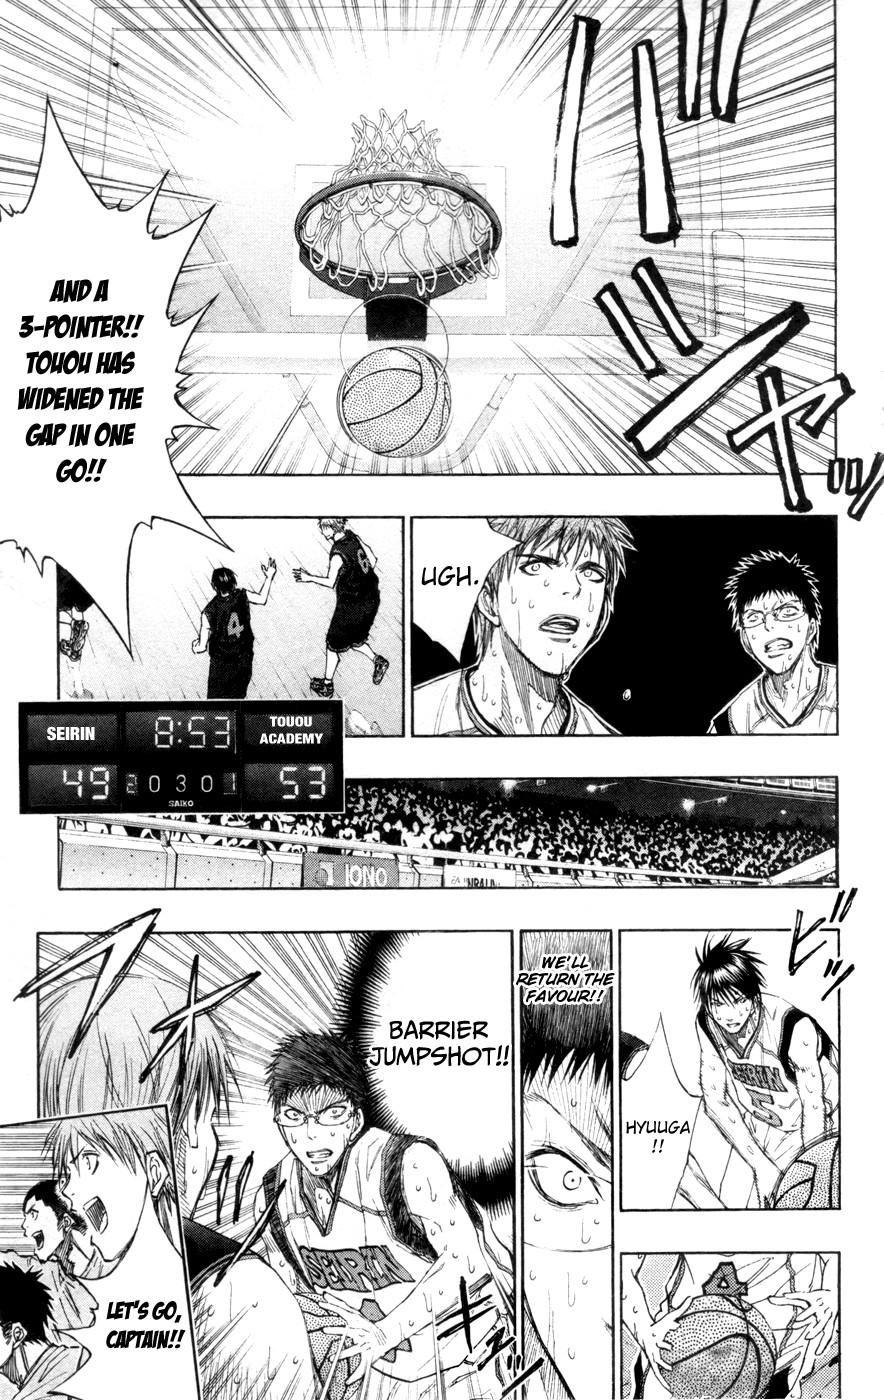 Kuroko no Basket Manga Chapter 126 - Image 17